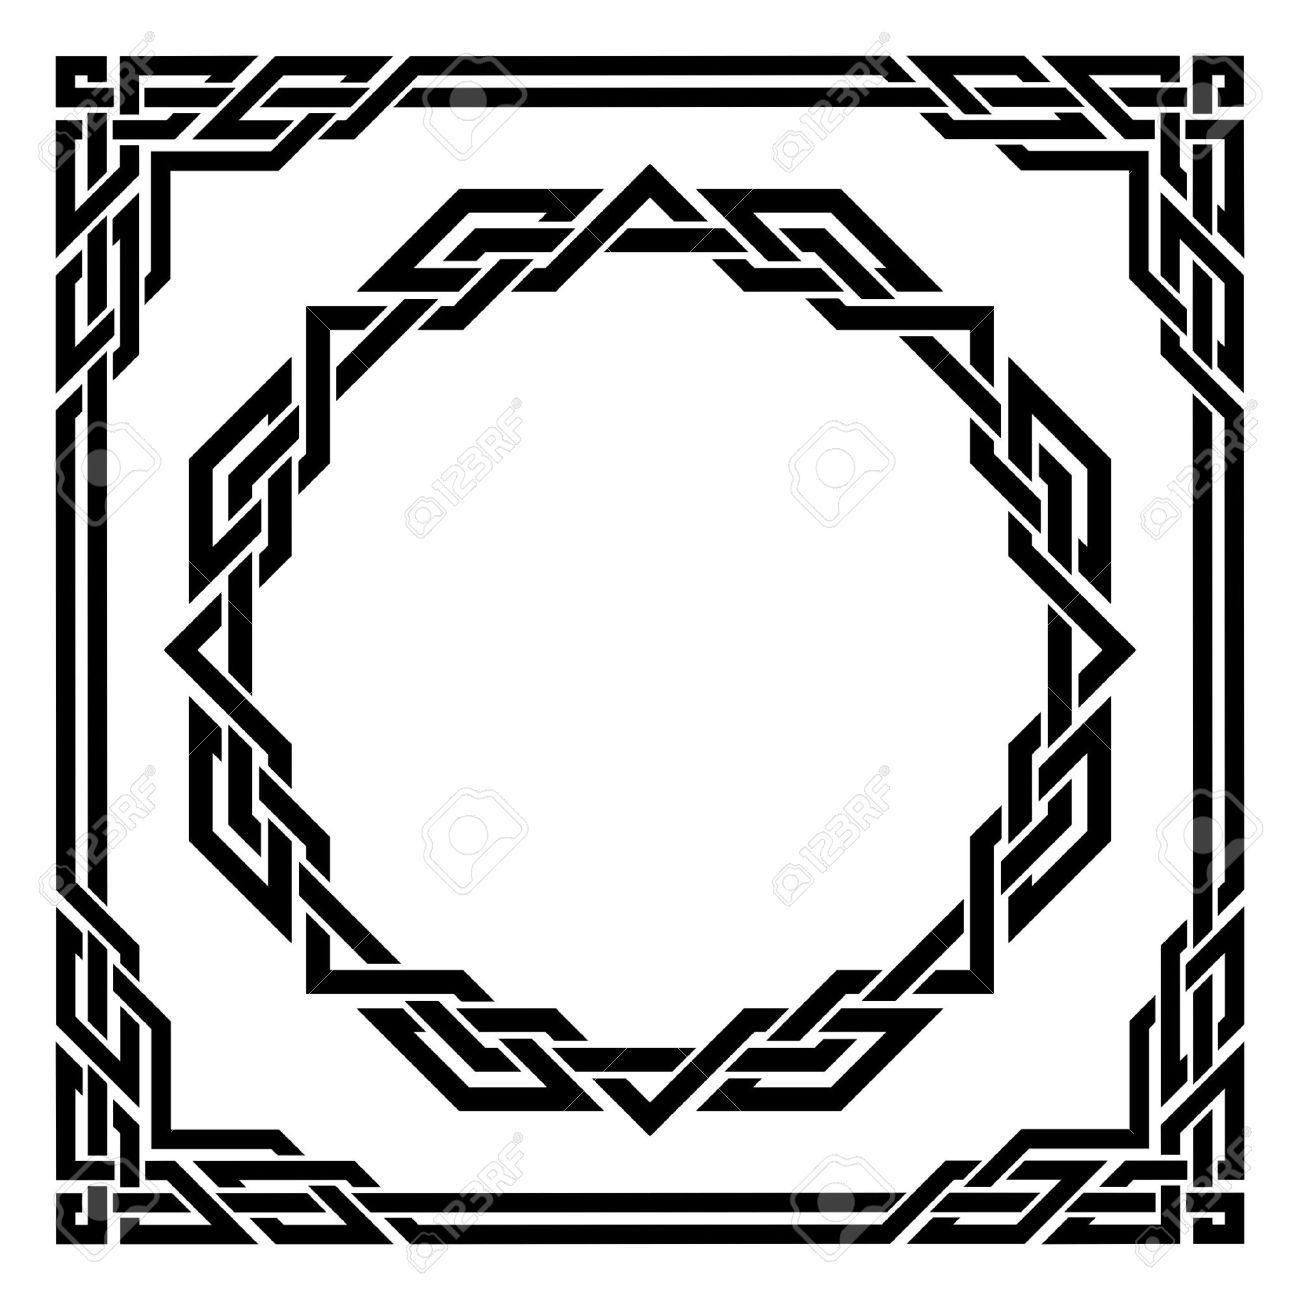 Celtic Circle Border Designs | www.imgkid.com - The Image ...